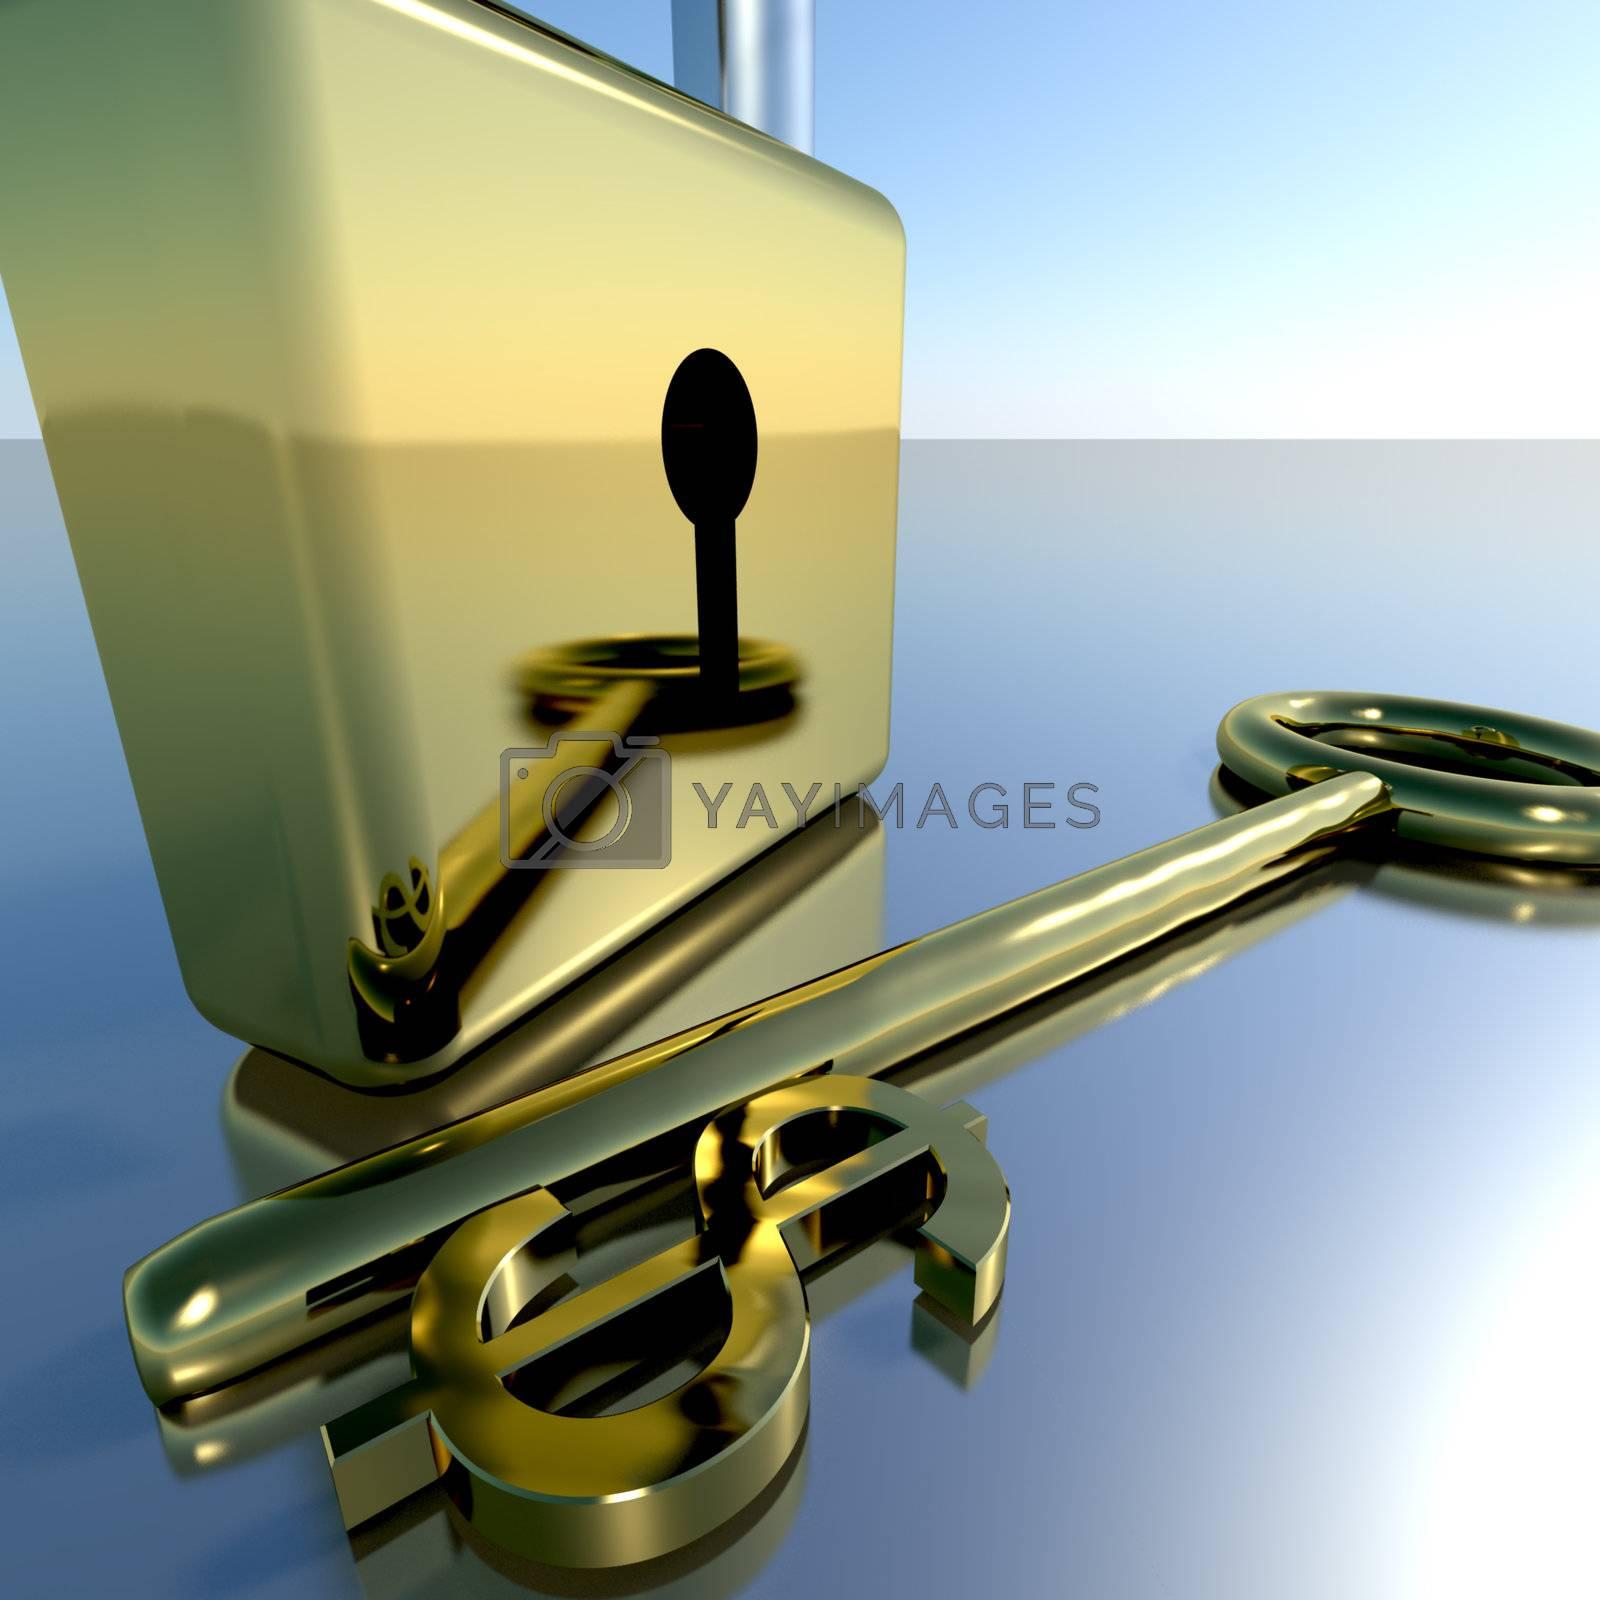 Dollar Key With Padlock Showing Banking Savings And Finances